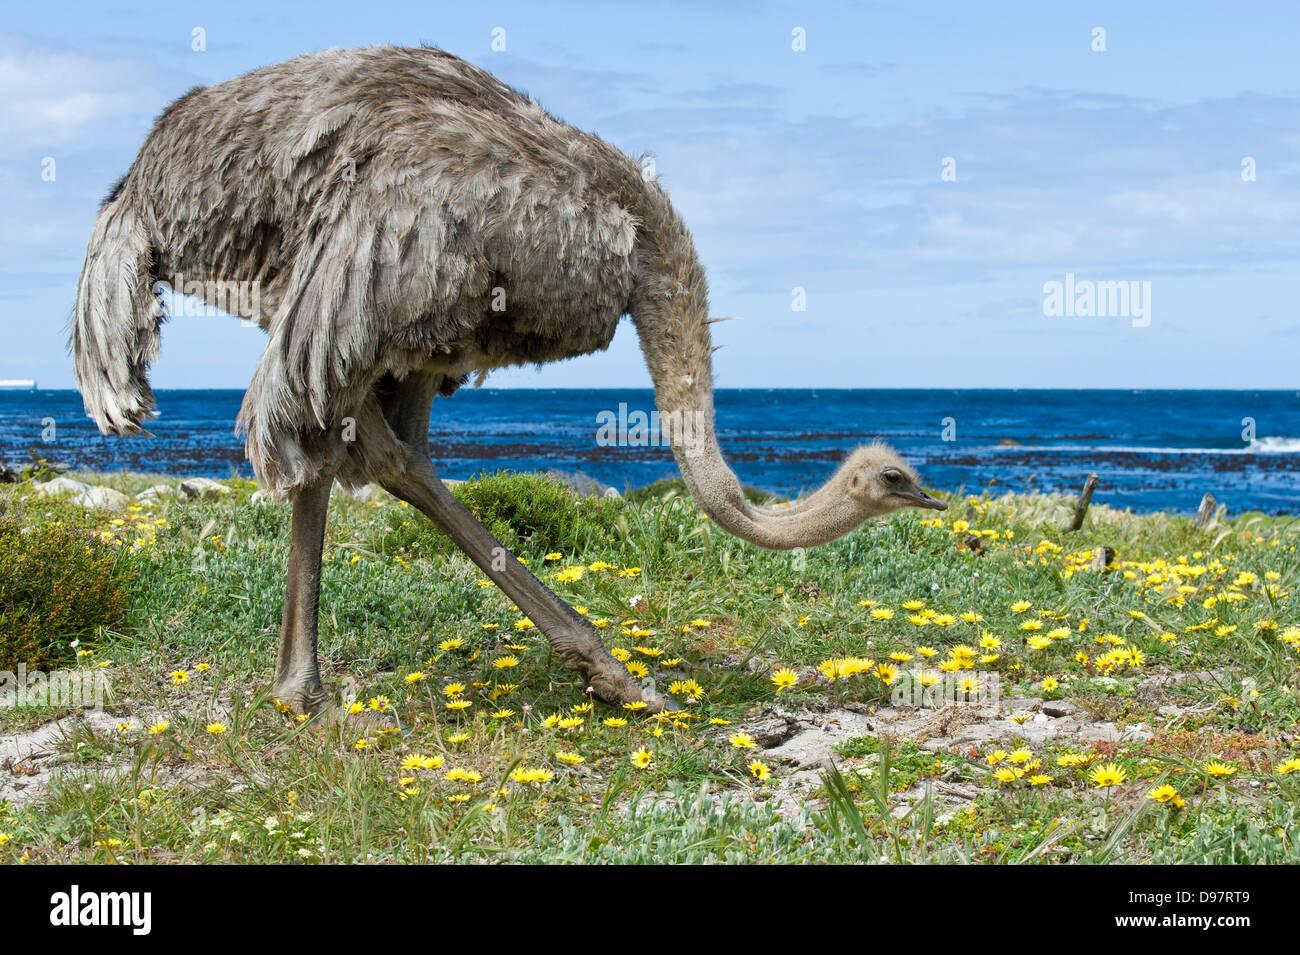 Hembra de avestruz (Struthio camelus), Cabo de Buena Esperanza, Western Cape, Sudáfrica Imagen De Stock